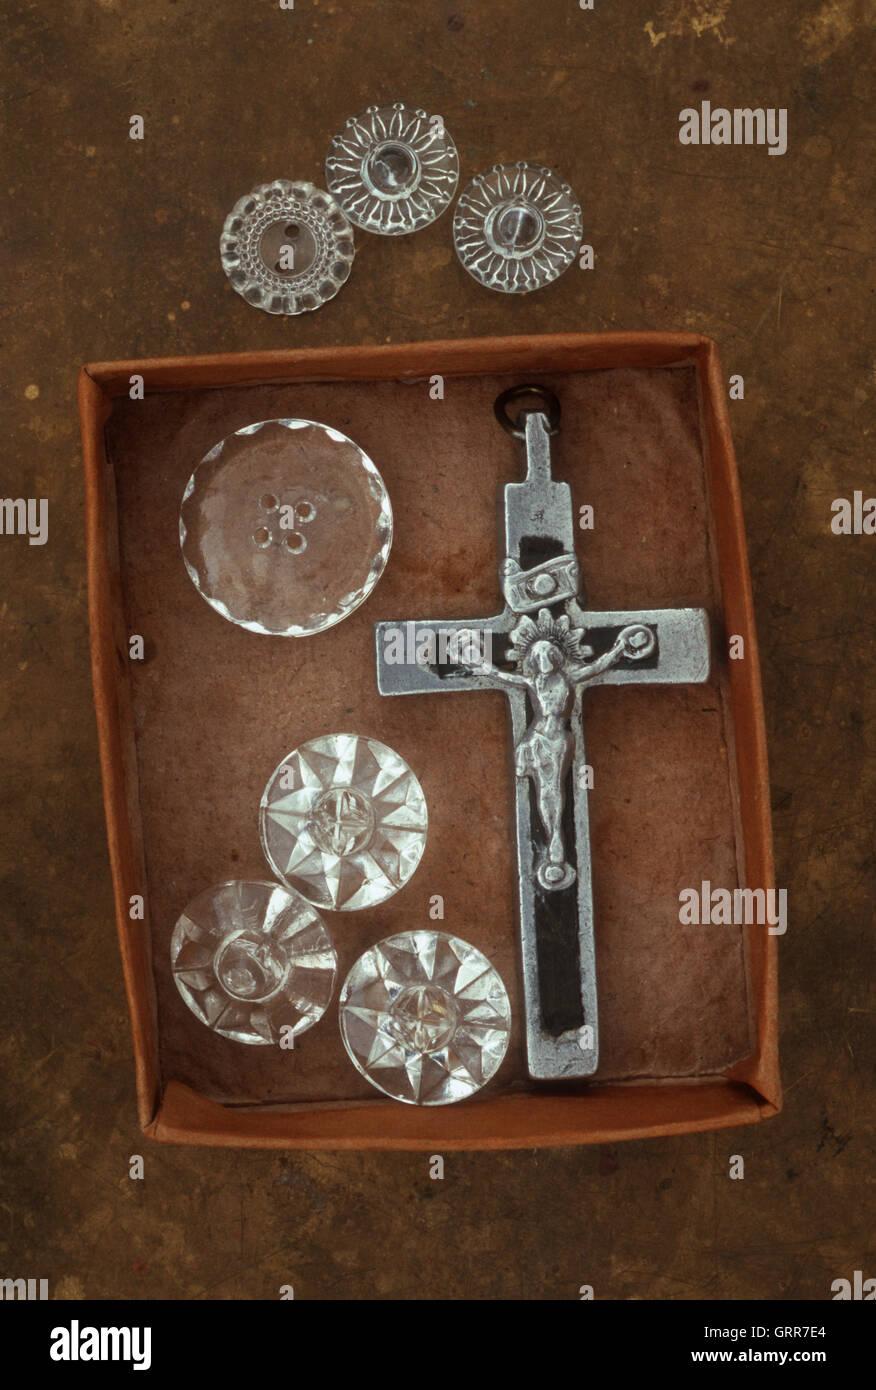 The Ebony Box Stockfotos & The Ebony Box Bilder - Alamy